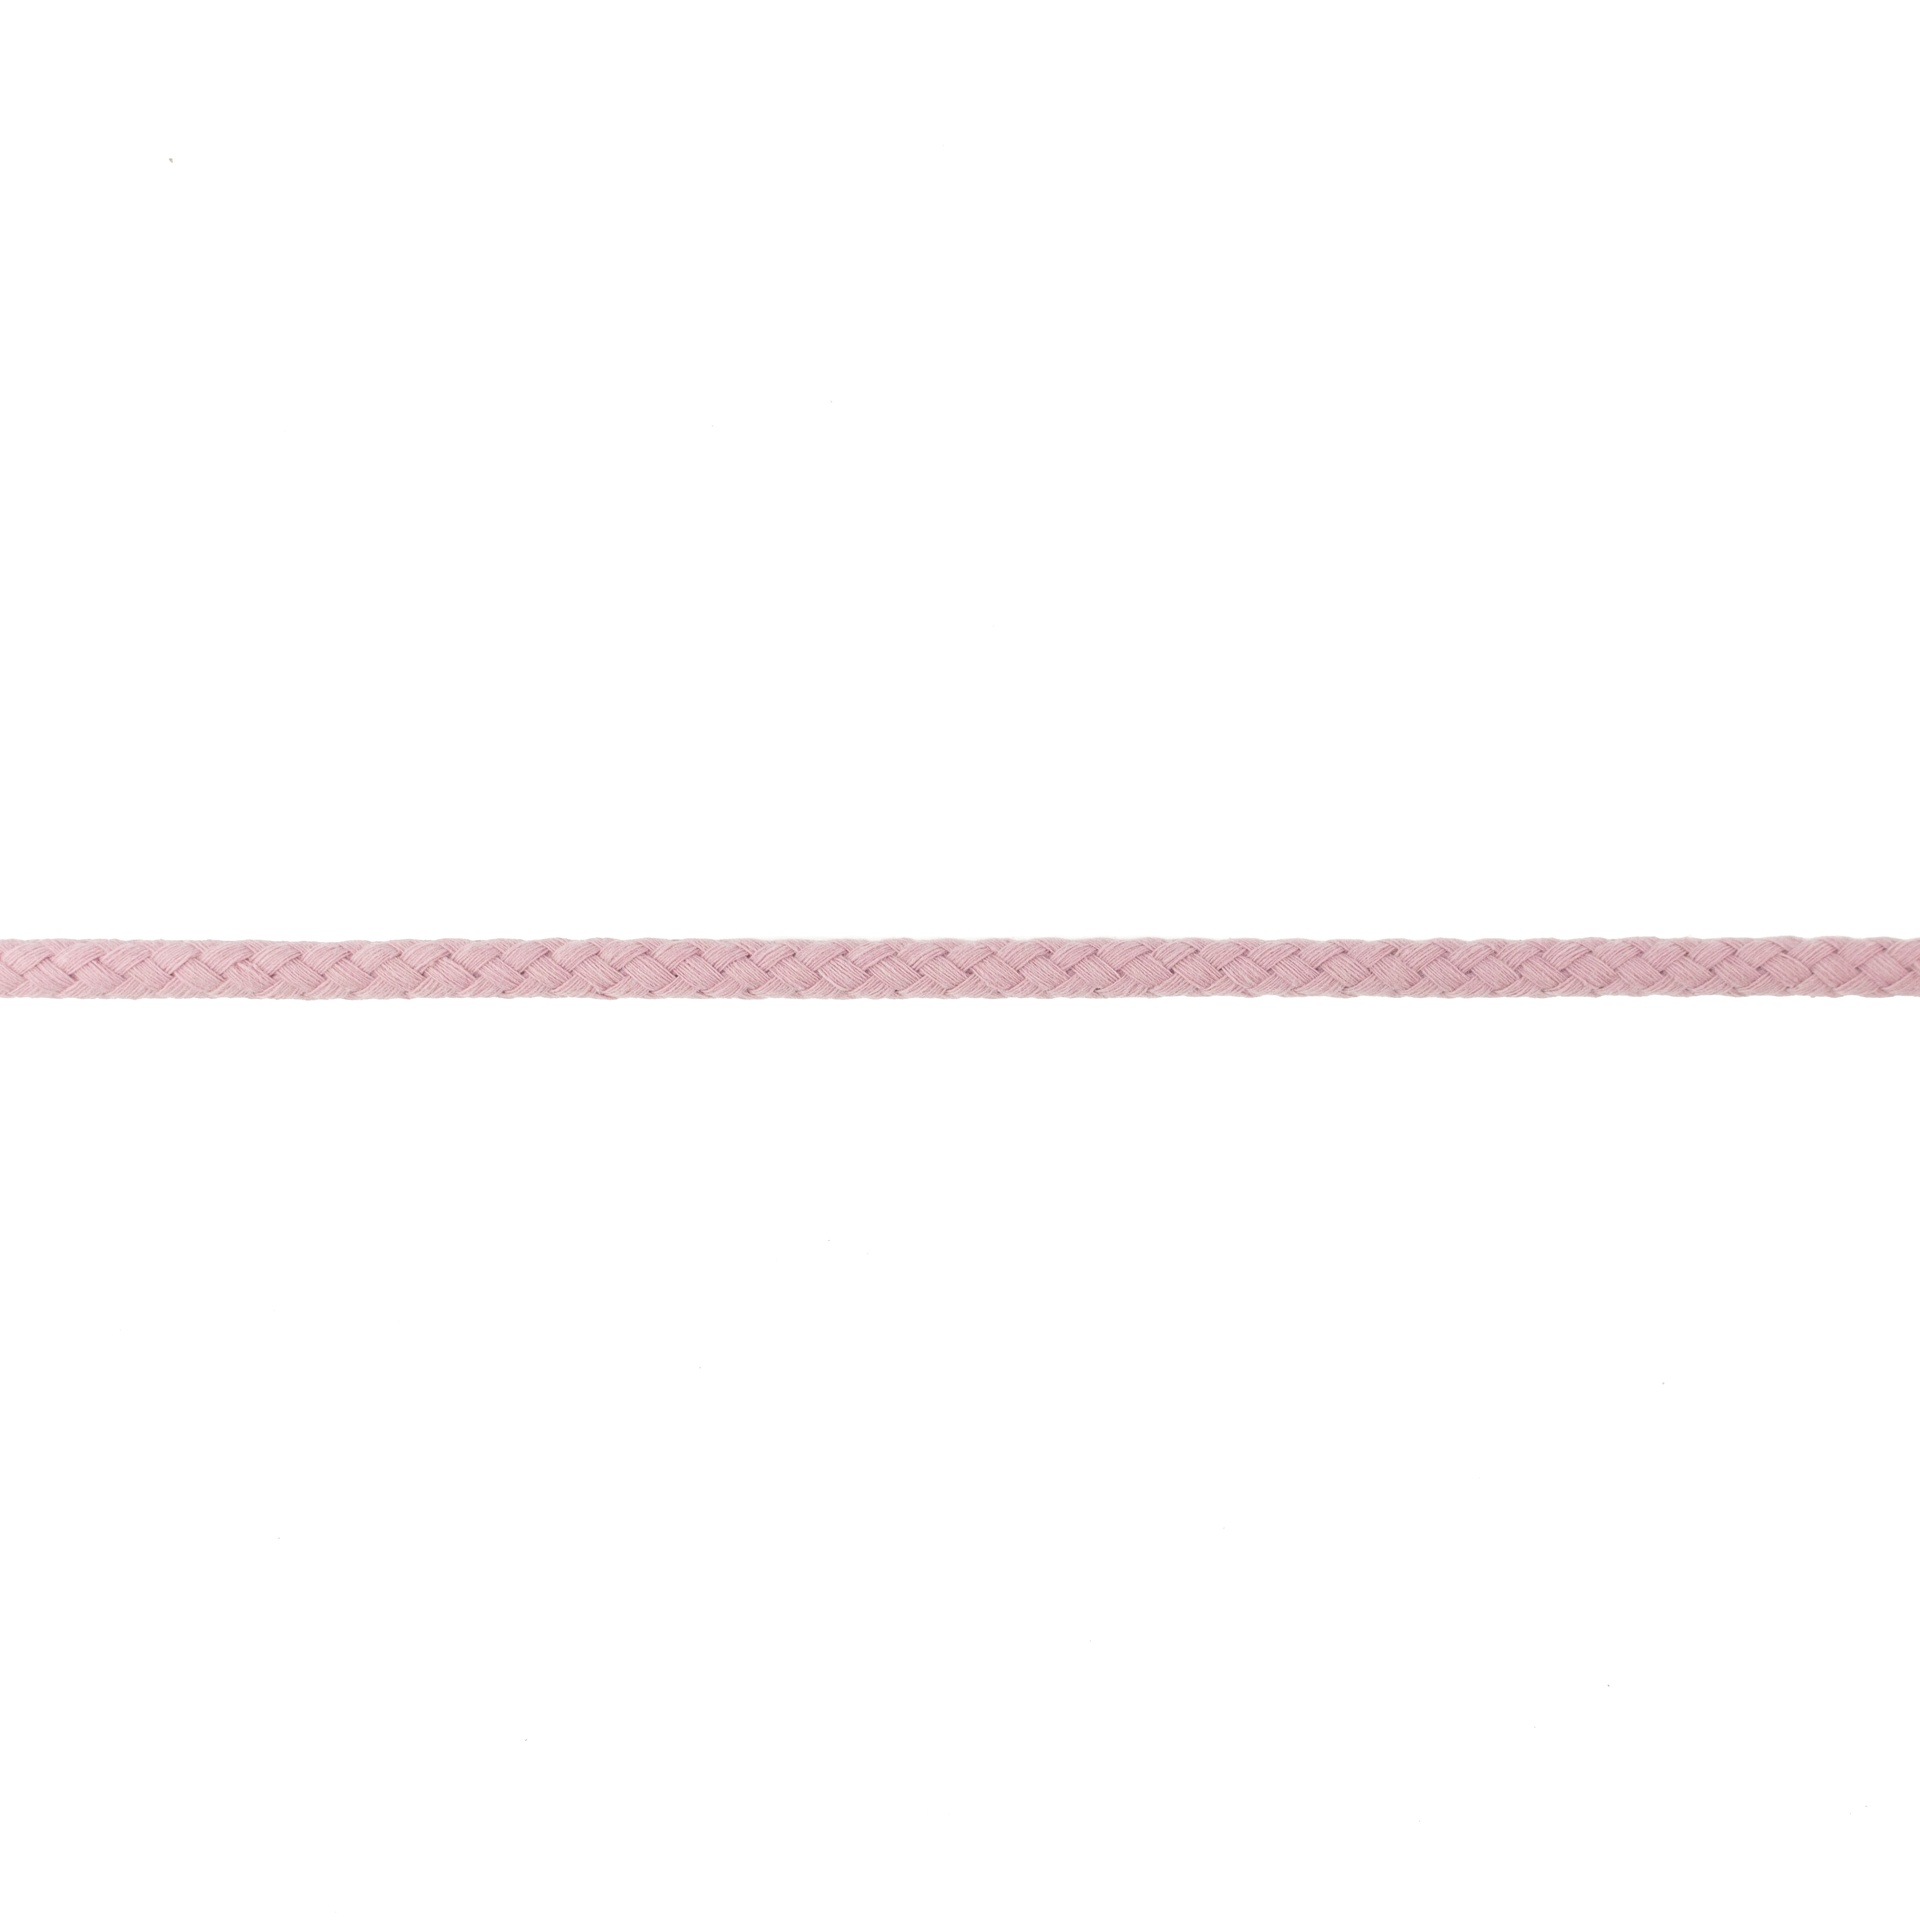 Doppelt gewebte Baumwollkordel - 8mm - Altrosa